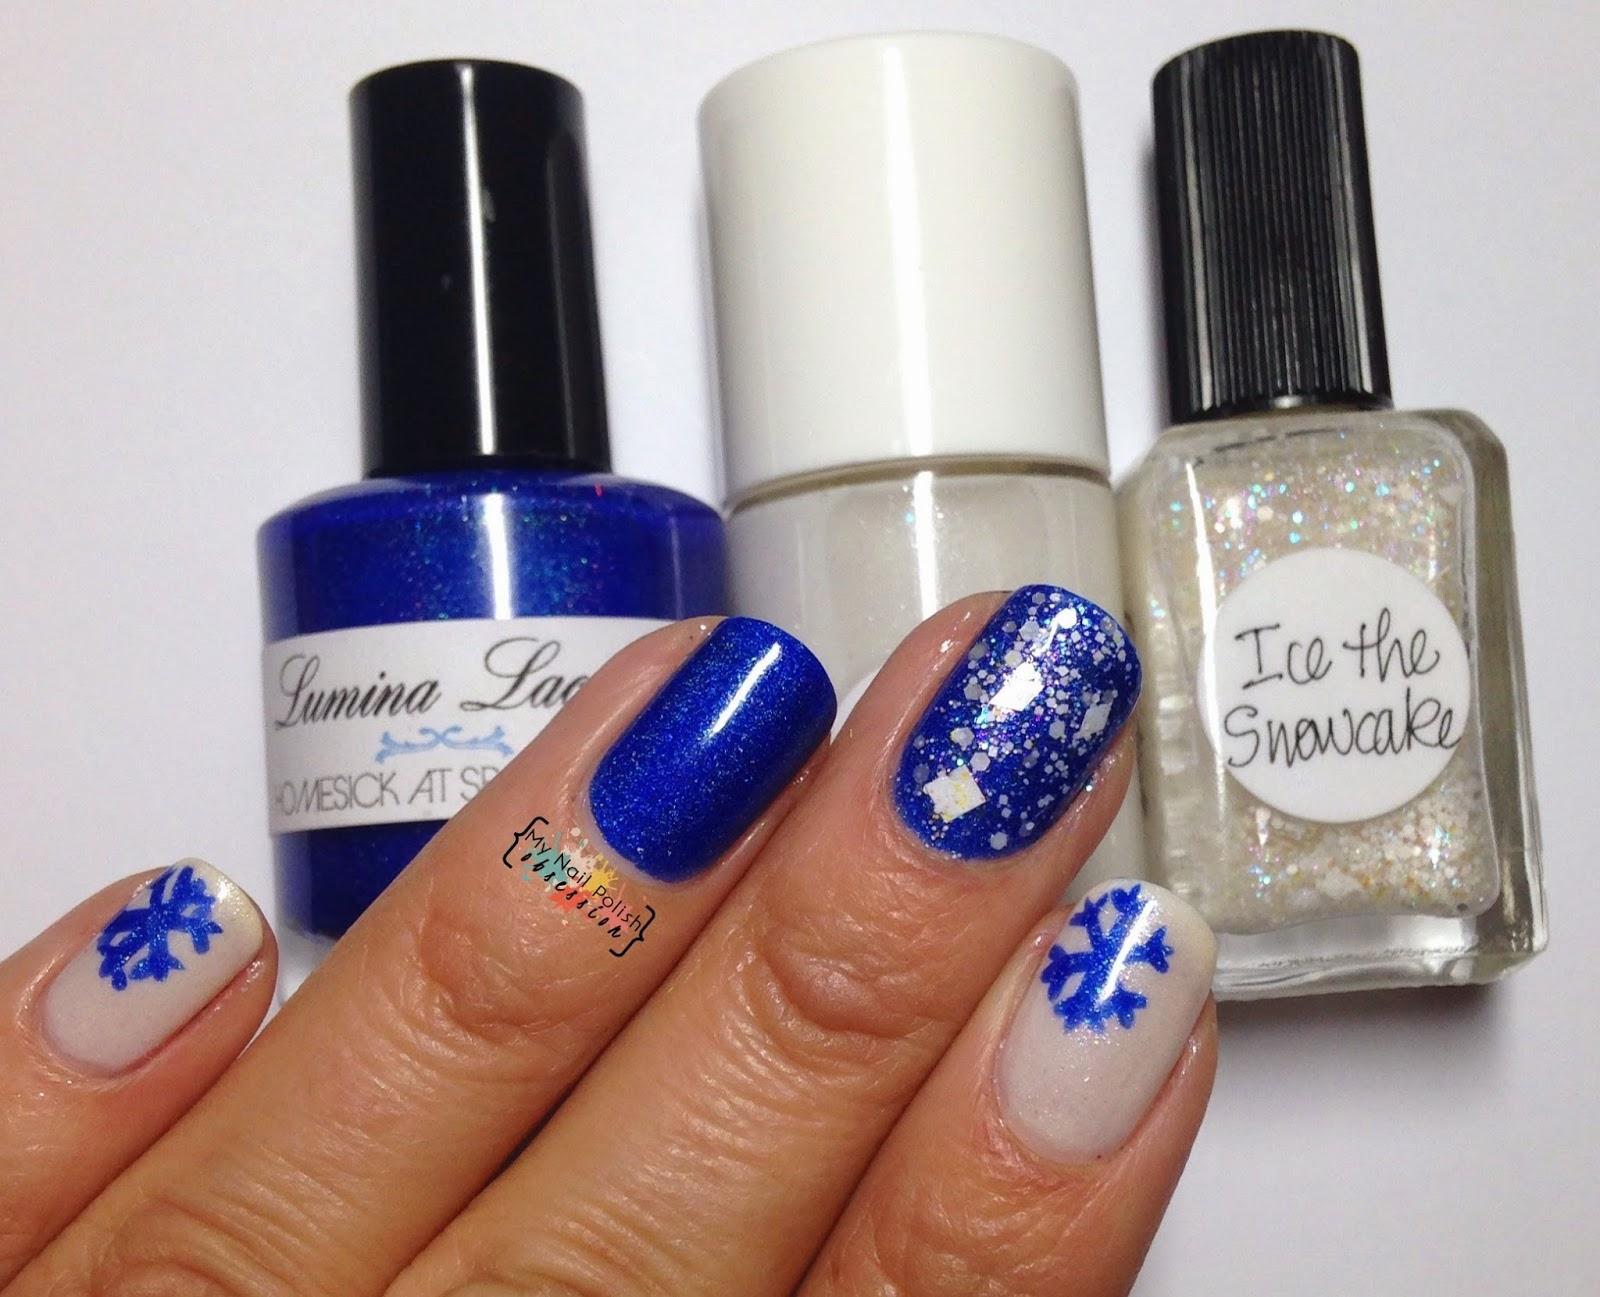 Blue Christmas mani, Lumina Lacquer Homesick at Spacecamp, The Nail Junkie Snowflake, Lynnderella Ice the Snowcake